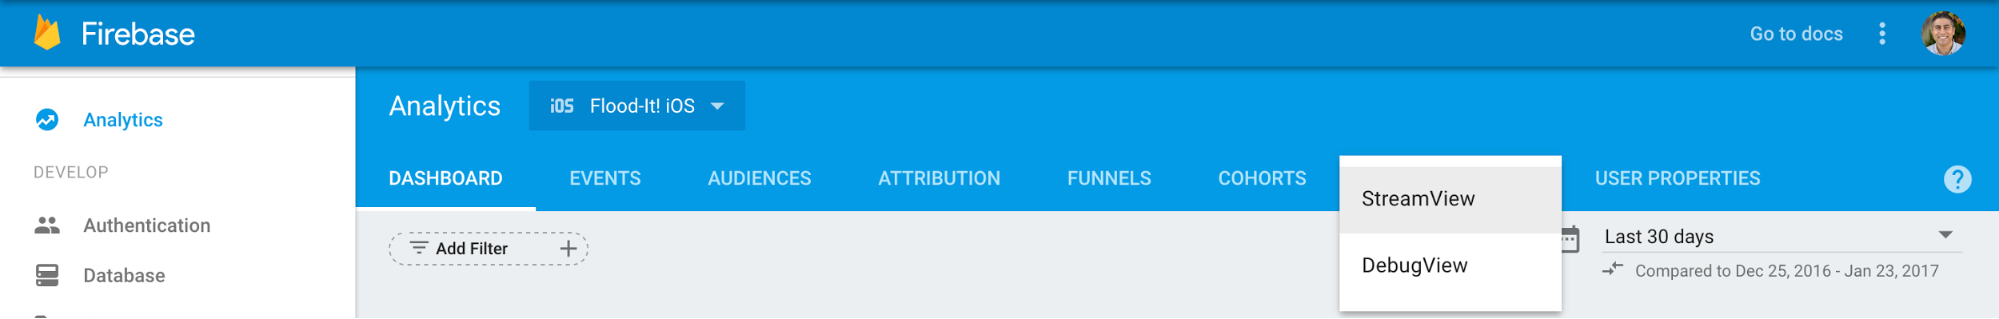 通過選擇 Google Analytics 頂部導航中 StreamView 旁邊的箭頭並選擇 DebugView 導航到 DebugView